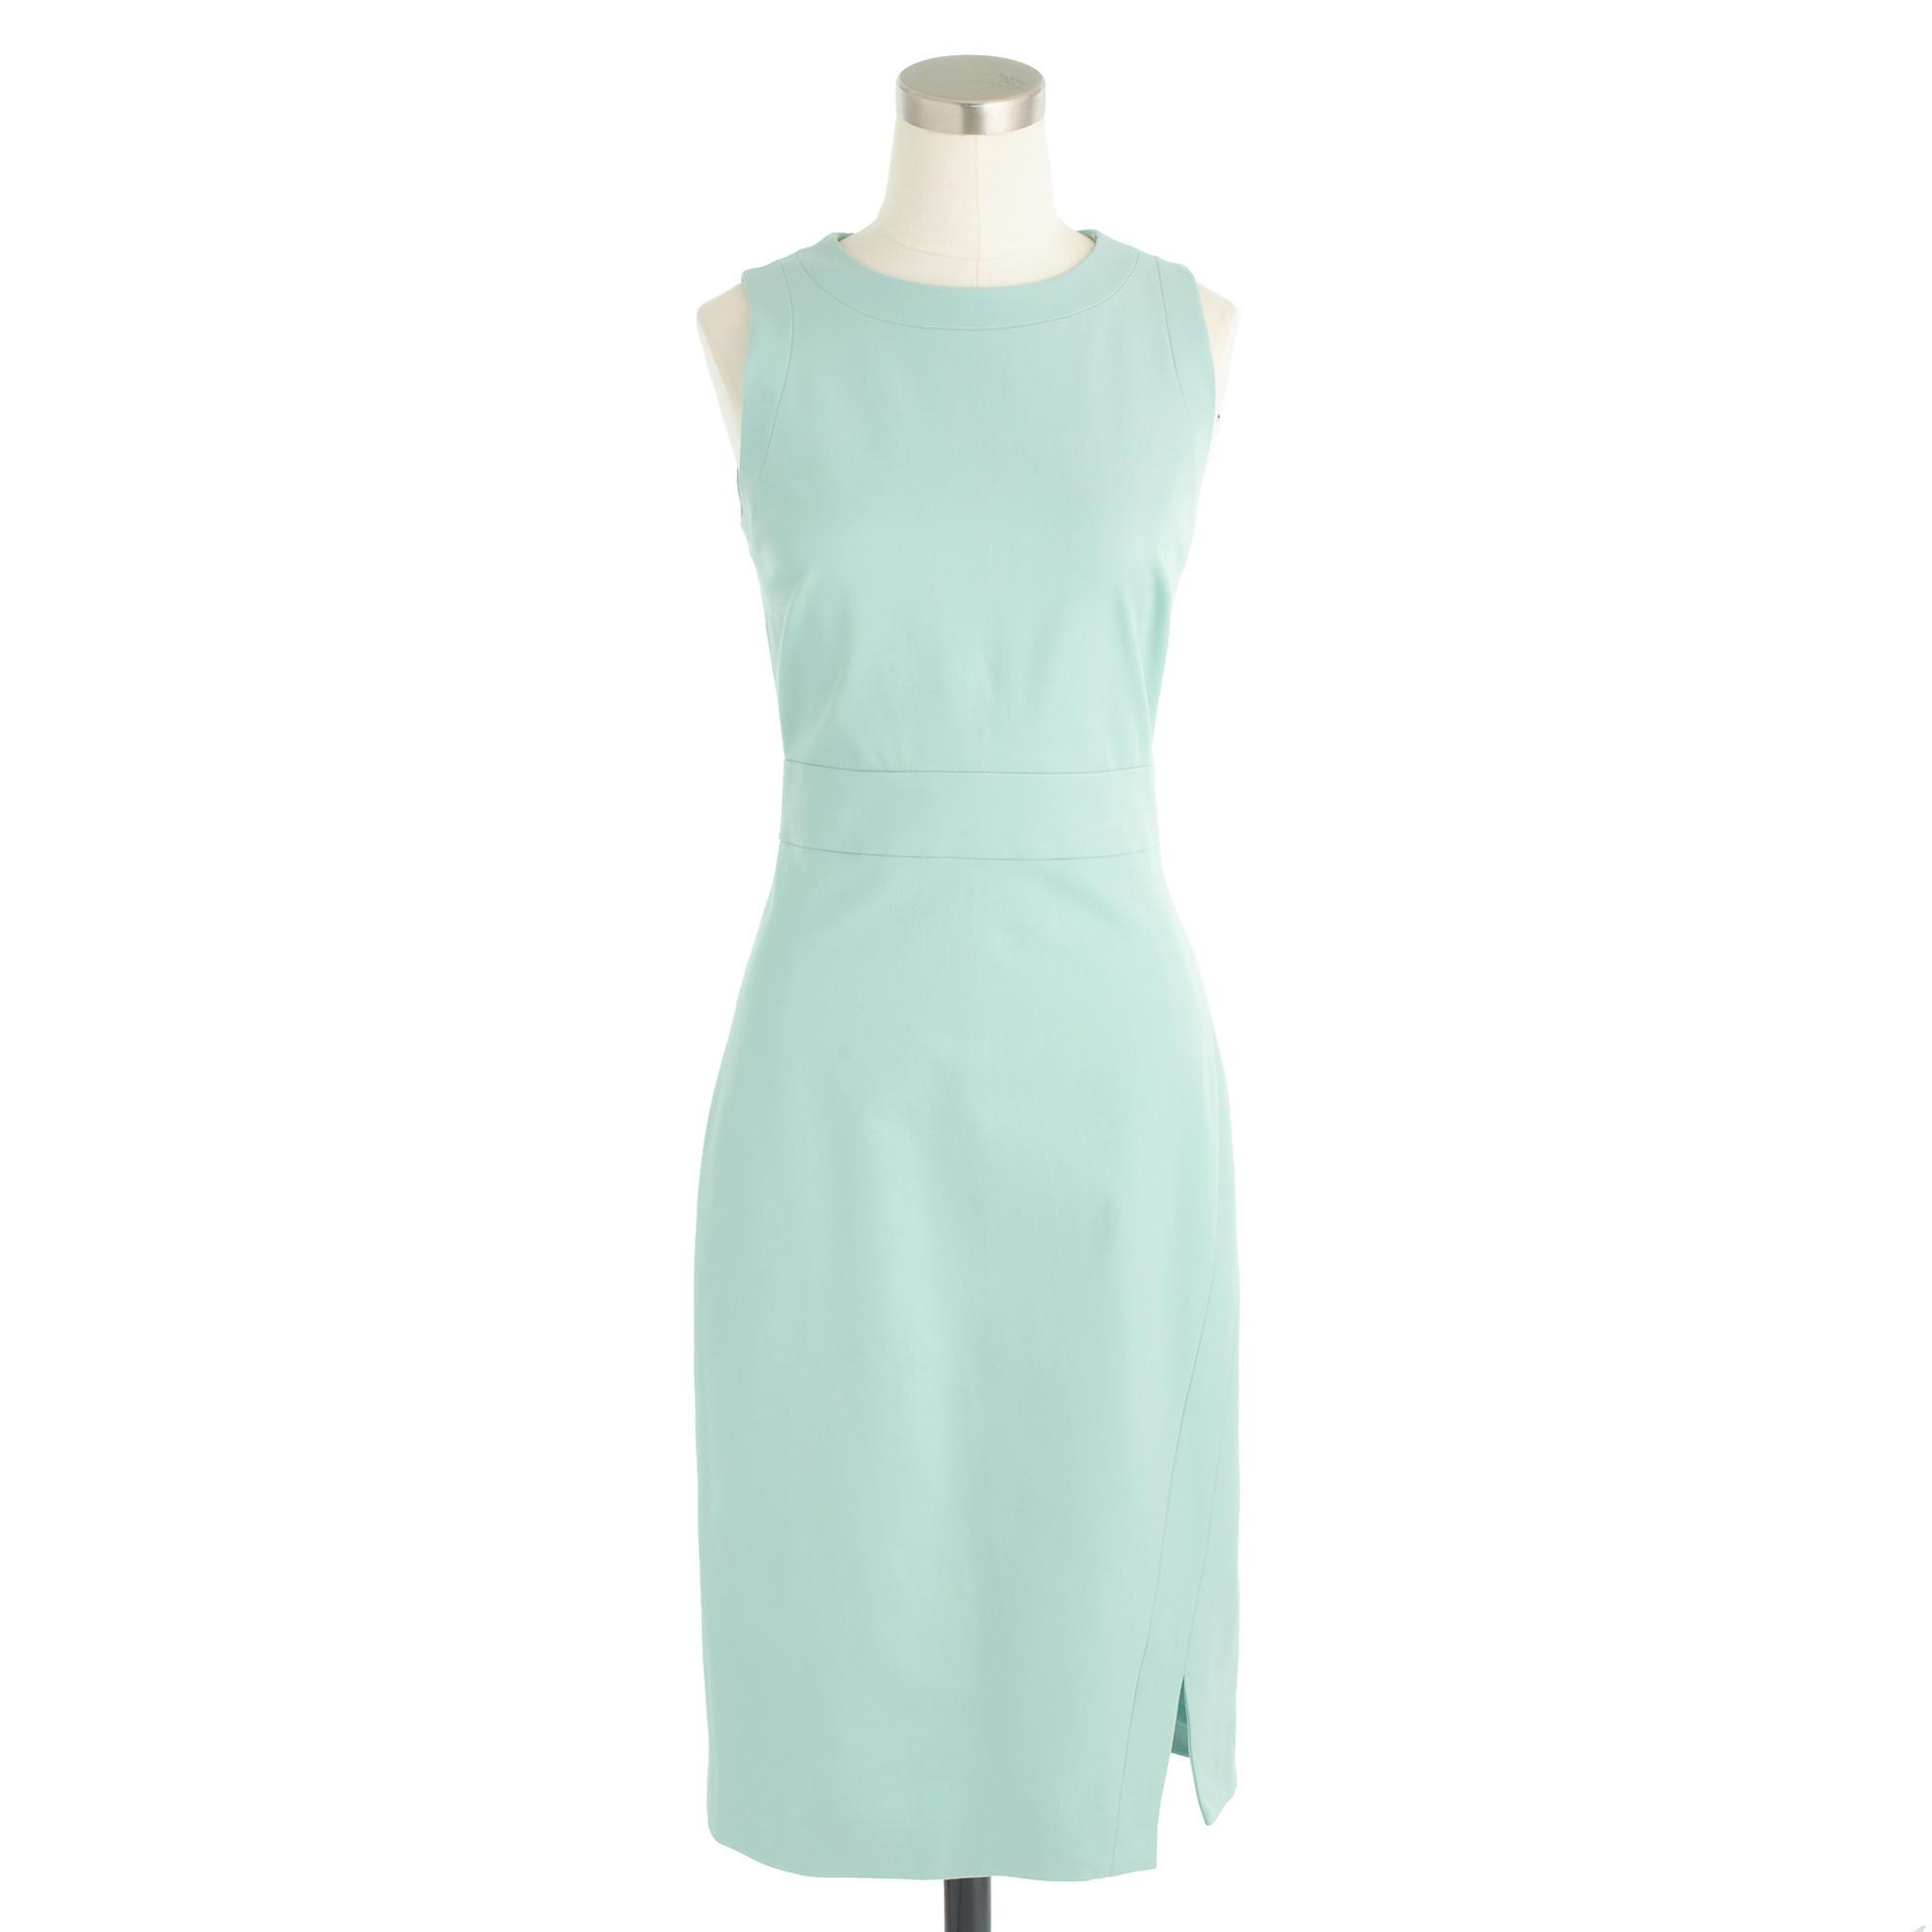 Lyst - J.Crew Petite Sleeveless Side-slit Sheath Dress In Stretch ...